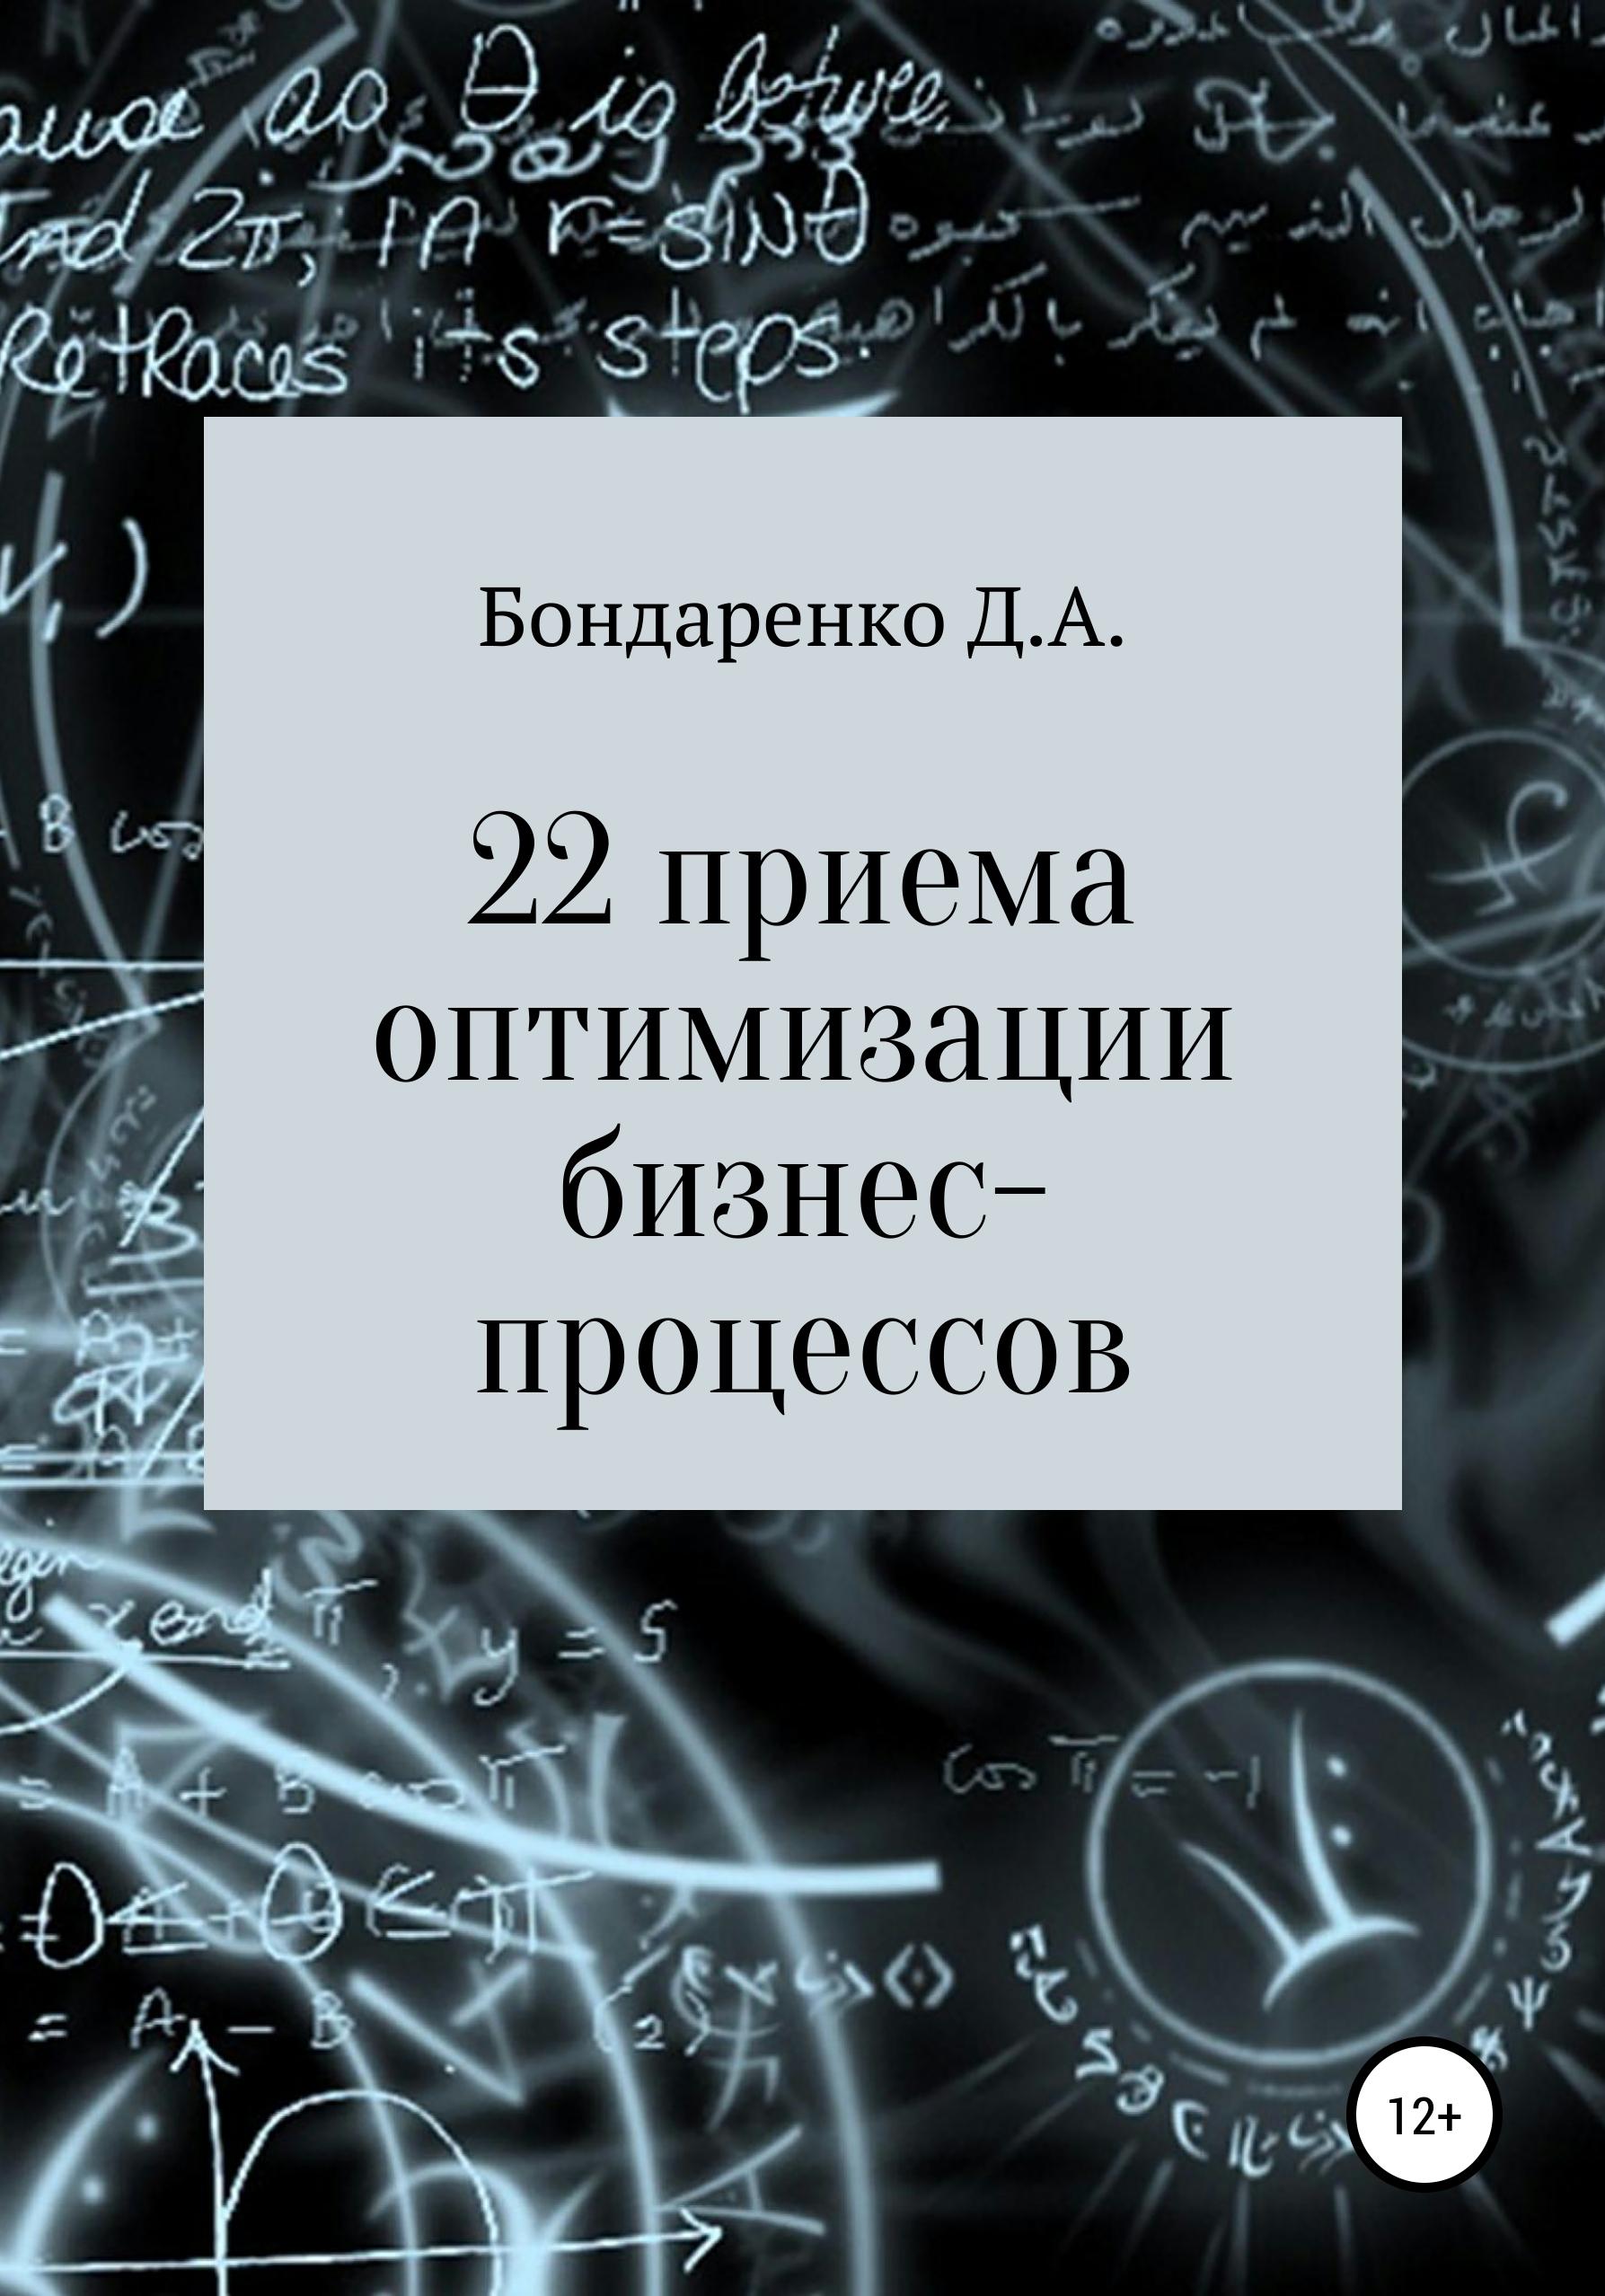 Обложка книги 22 приема оптимизации бизнес-процессов